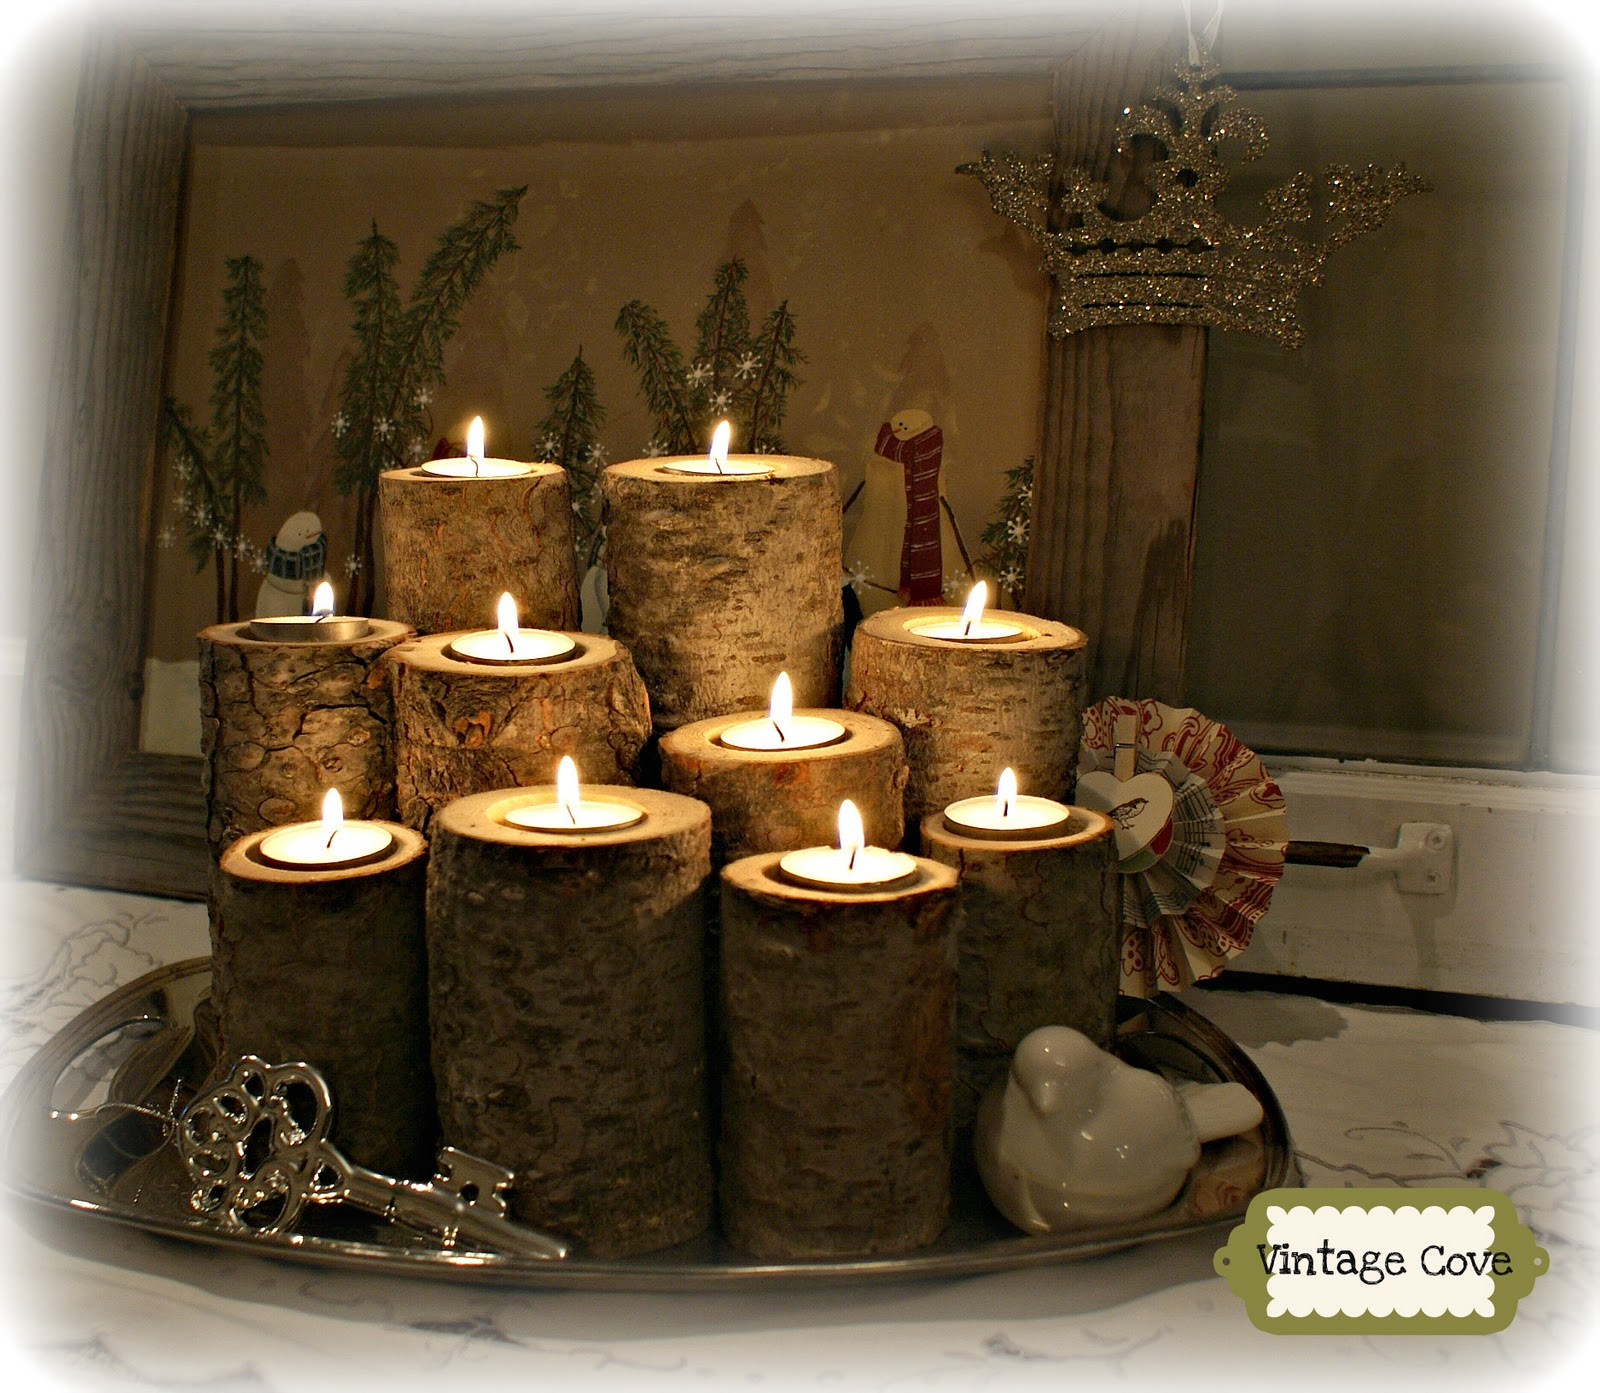 Vintage cove fir log tea light candles for Log candle holder how to make